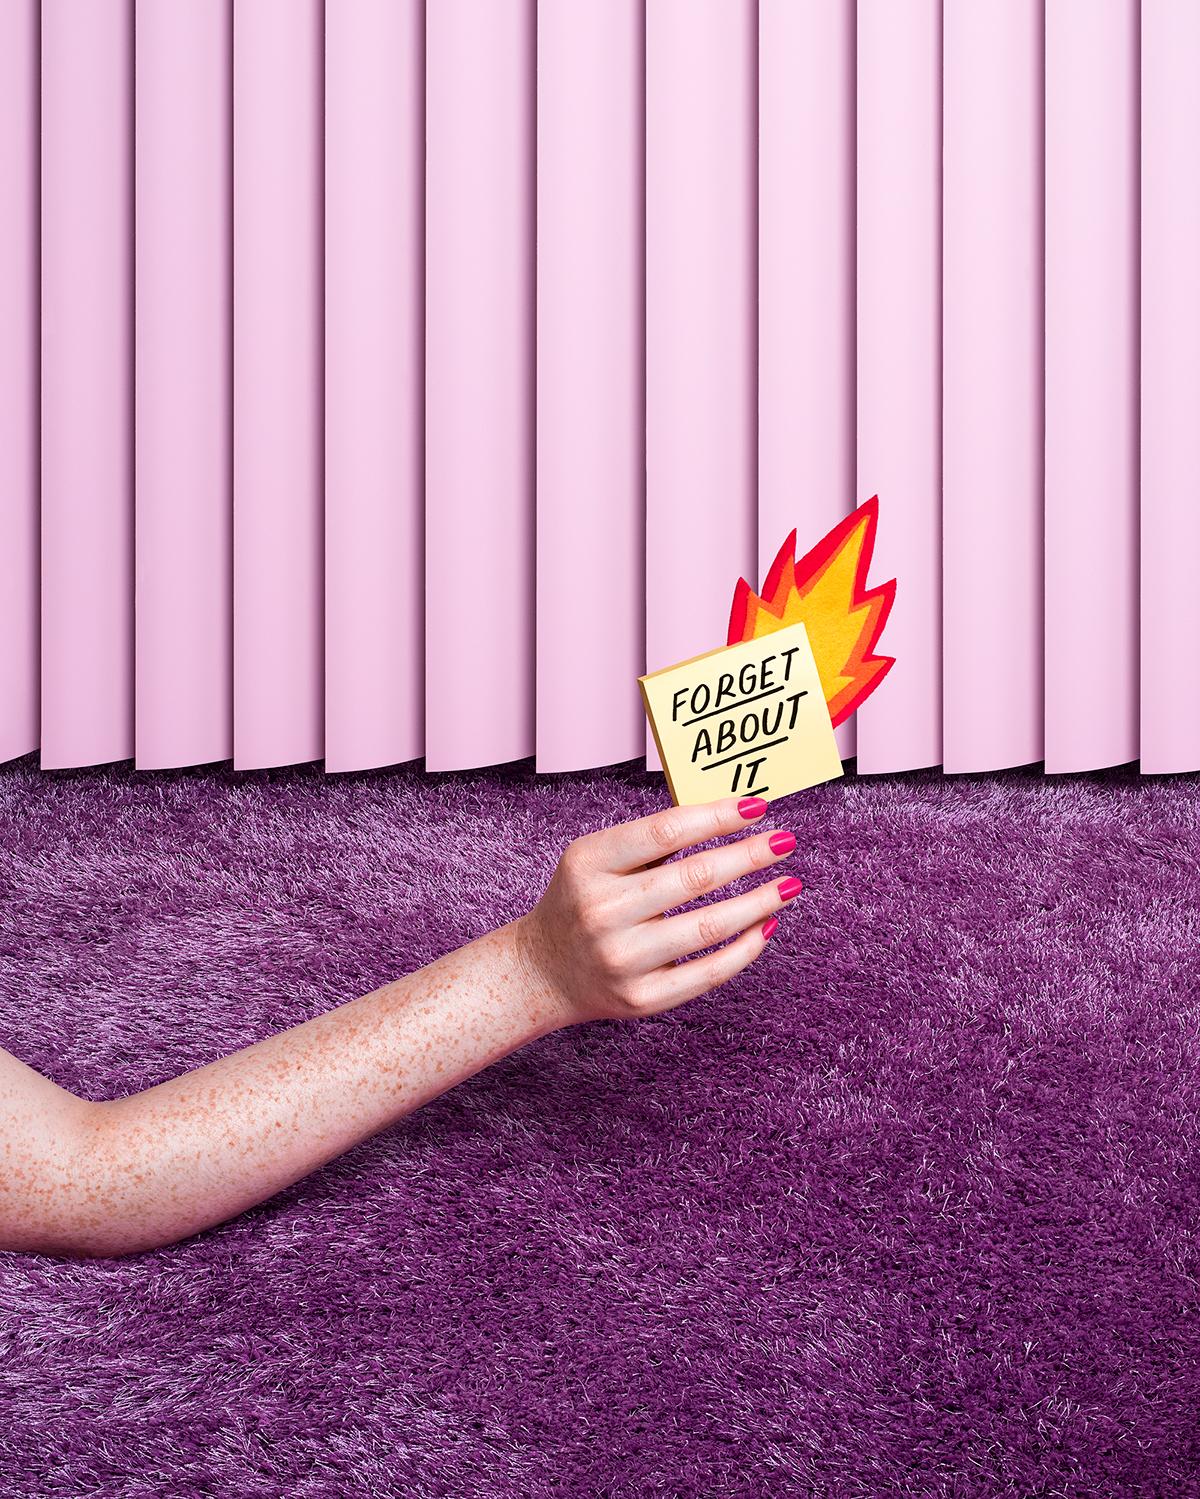 sidlee photoshoot editorial hairandmakeup